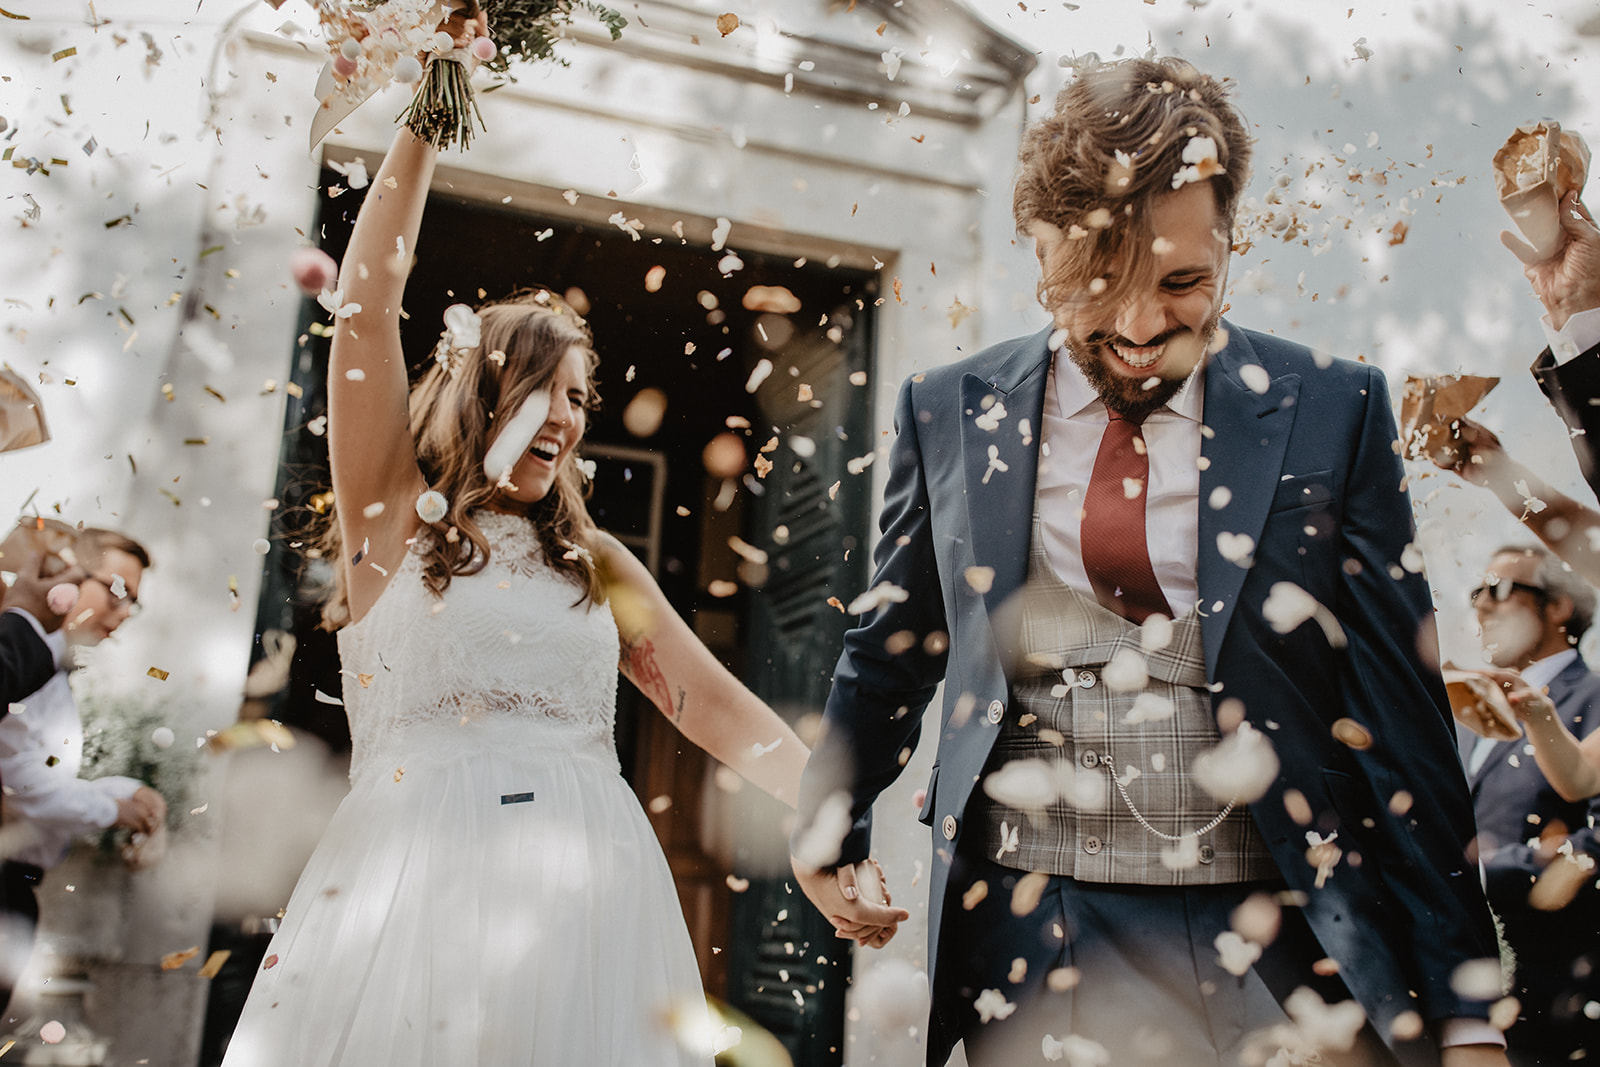 Lapela-photography-wedding-algarve-portugal-best-of-48.jpg